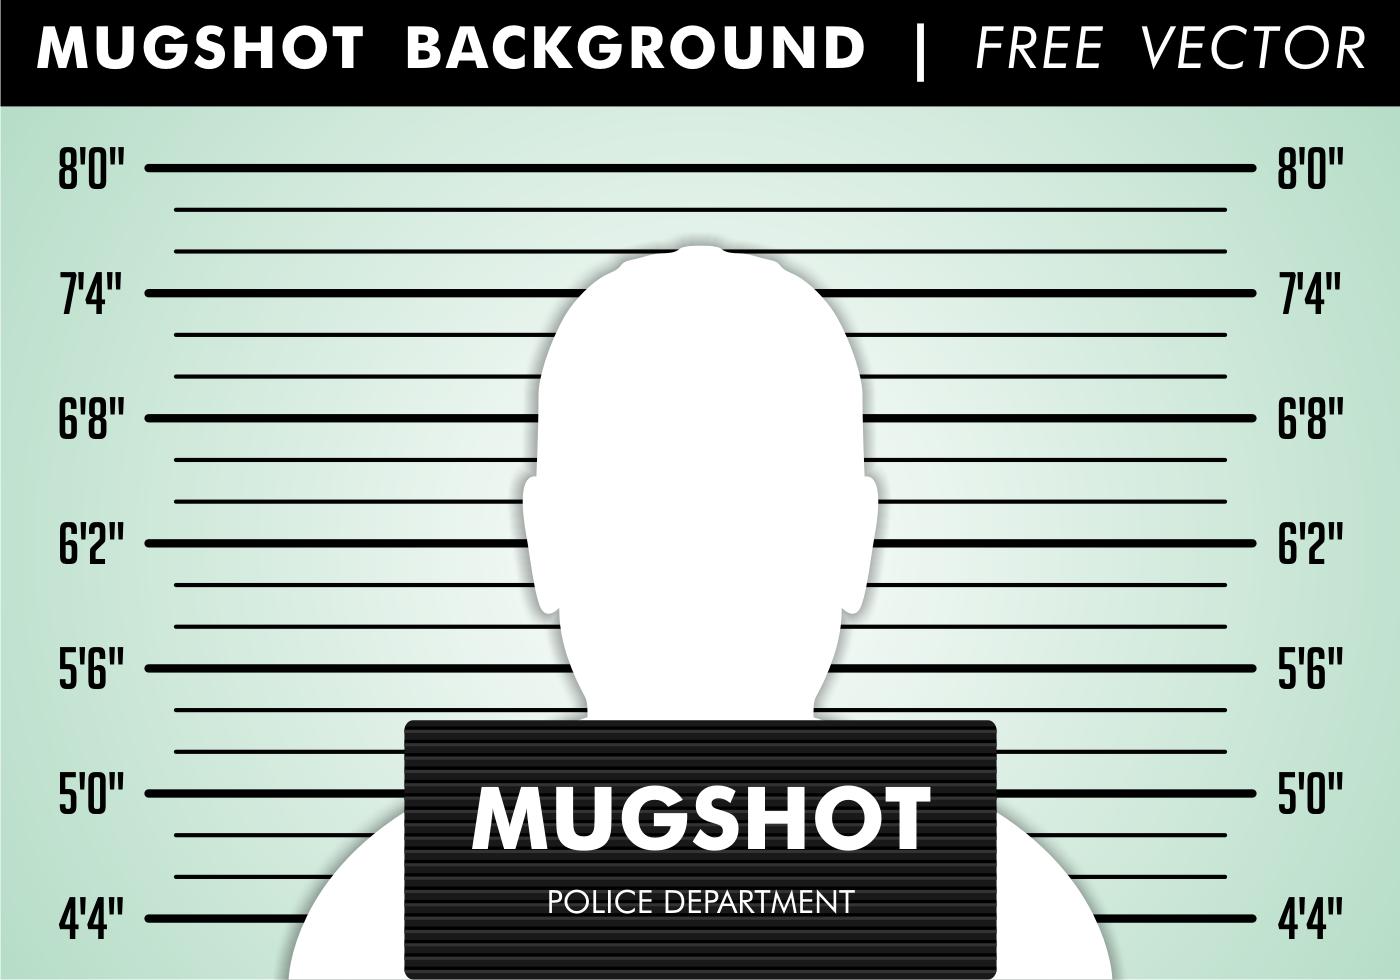 mugshot background free vector download free vector art